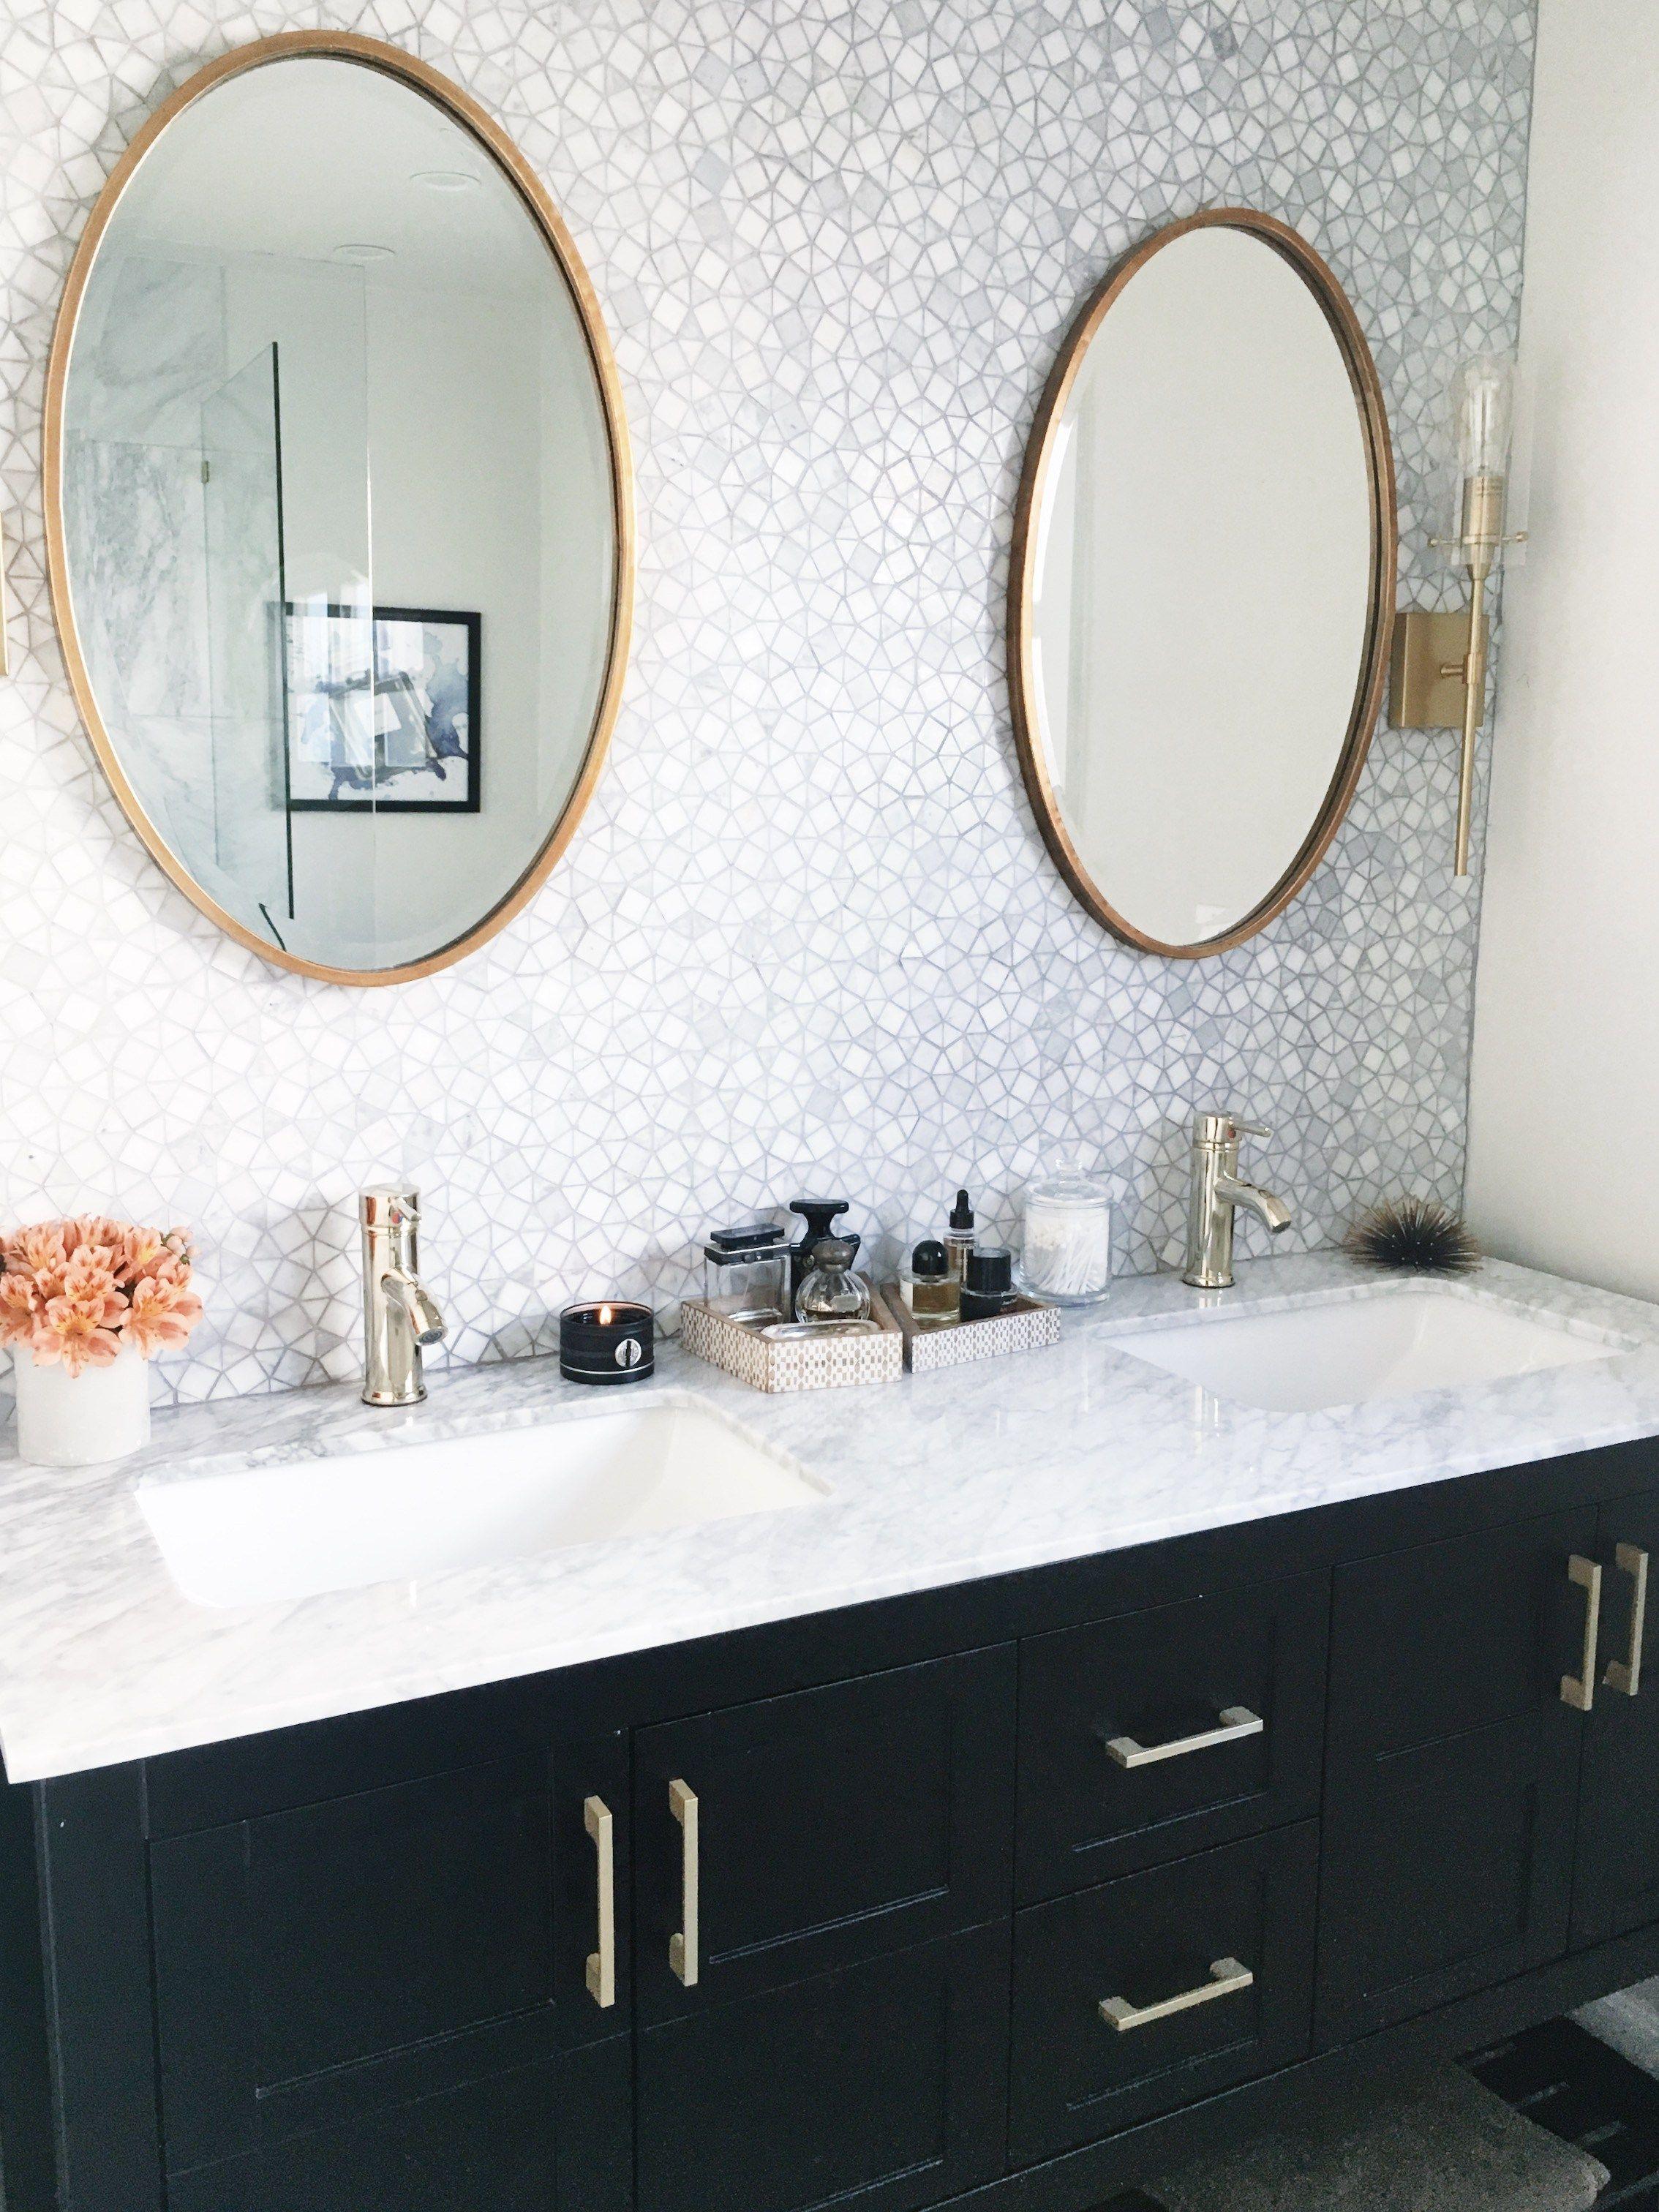 Tile obsession elegant bathroom vanity cococozy luxury